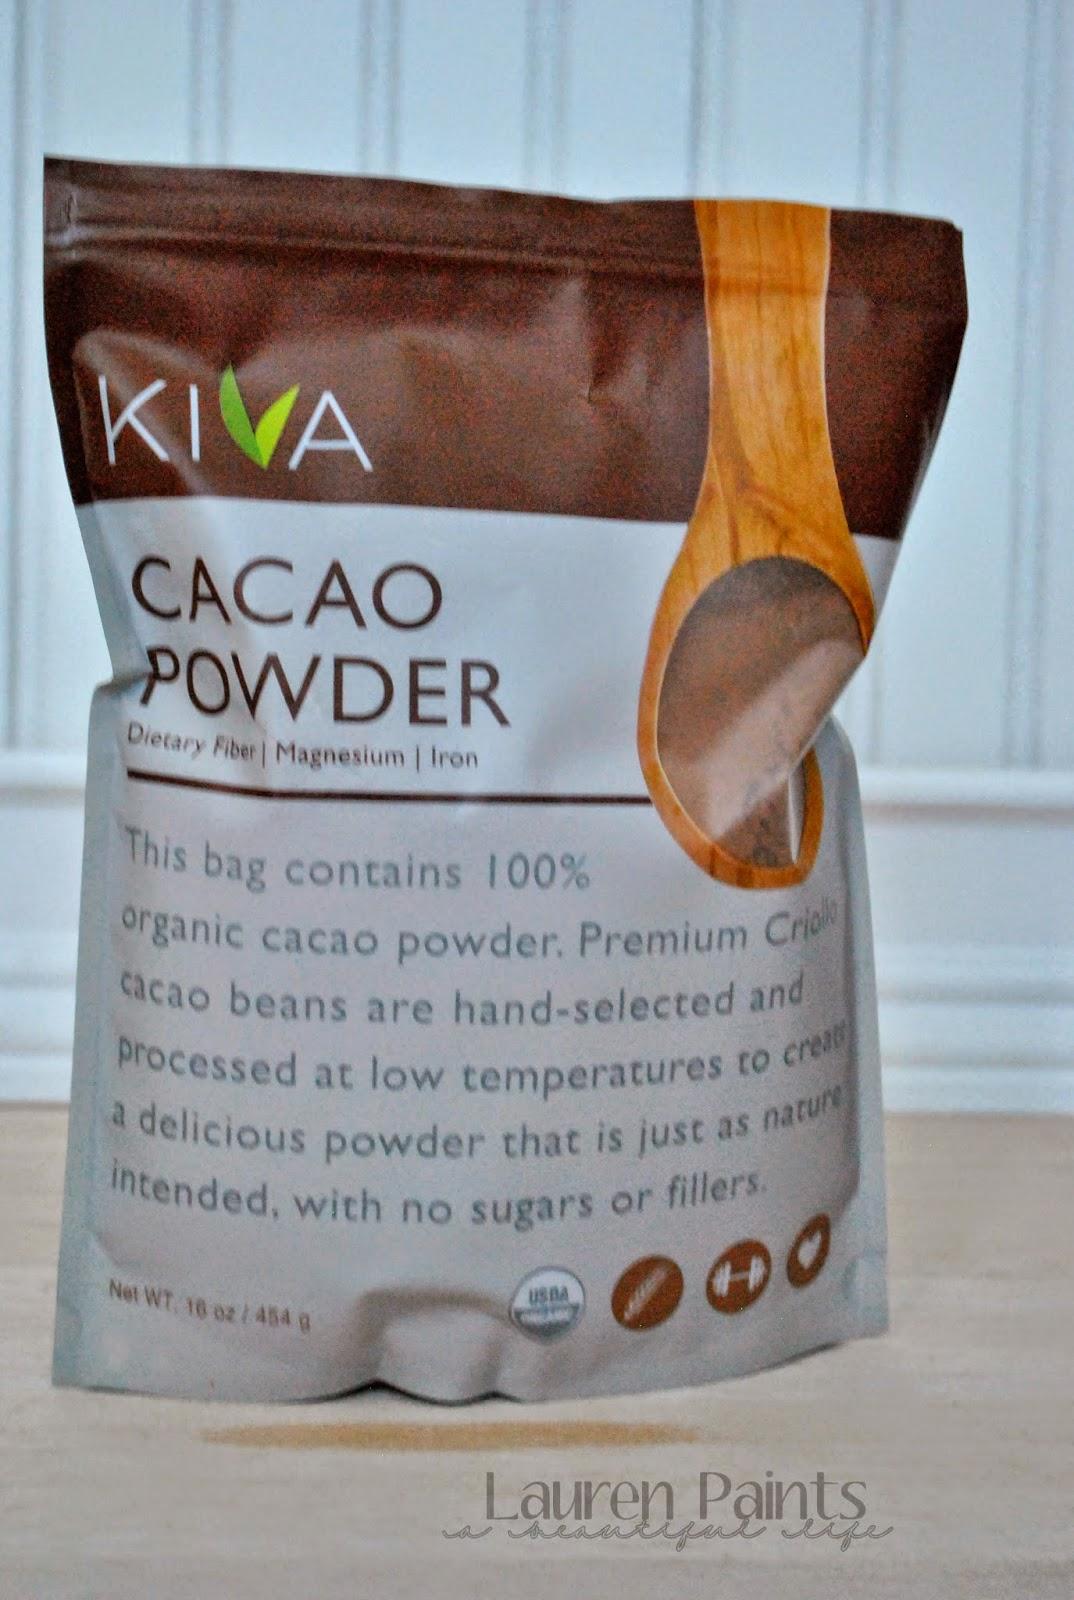 Kiva Cacao Powder Review